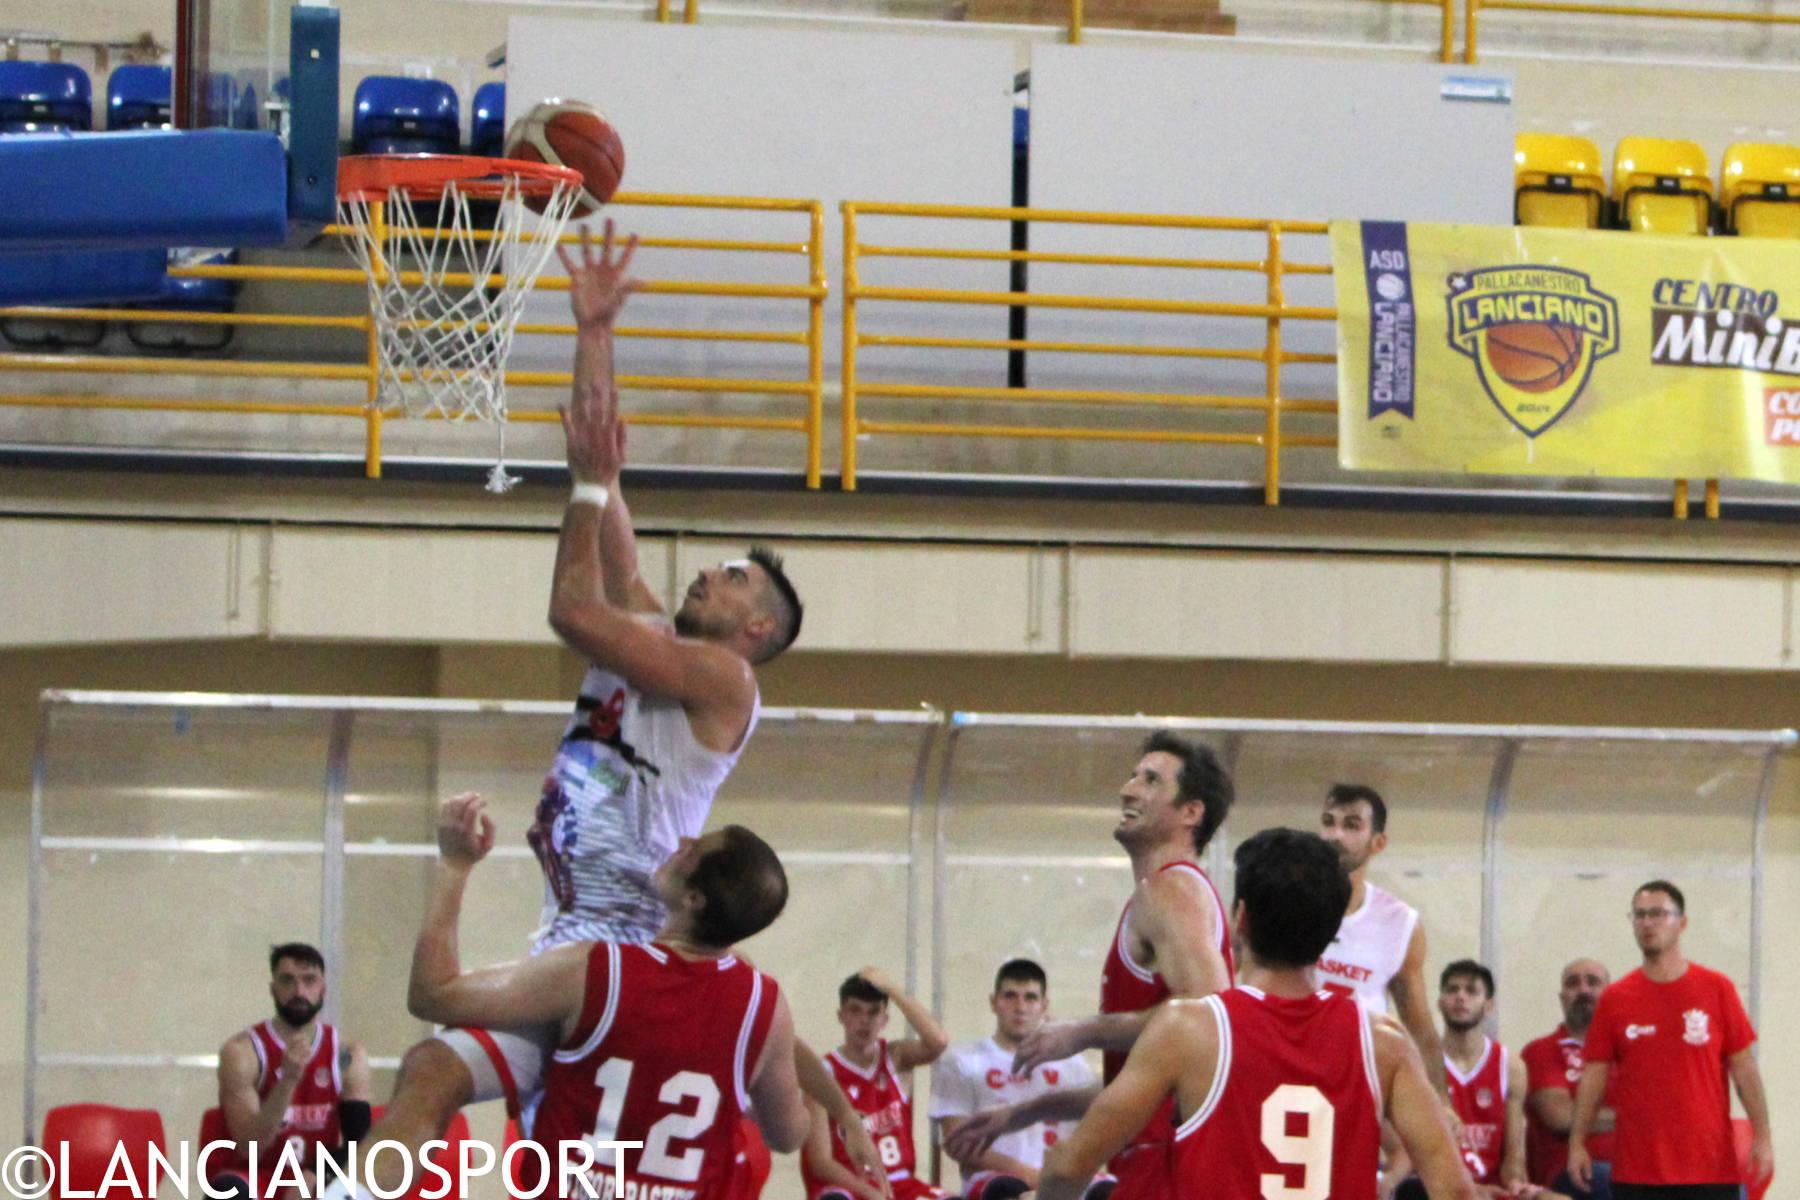 Unibasket ko all'esordio: a Lanciano passa la Vigor Matelica 📷